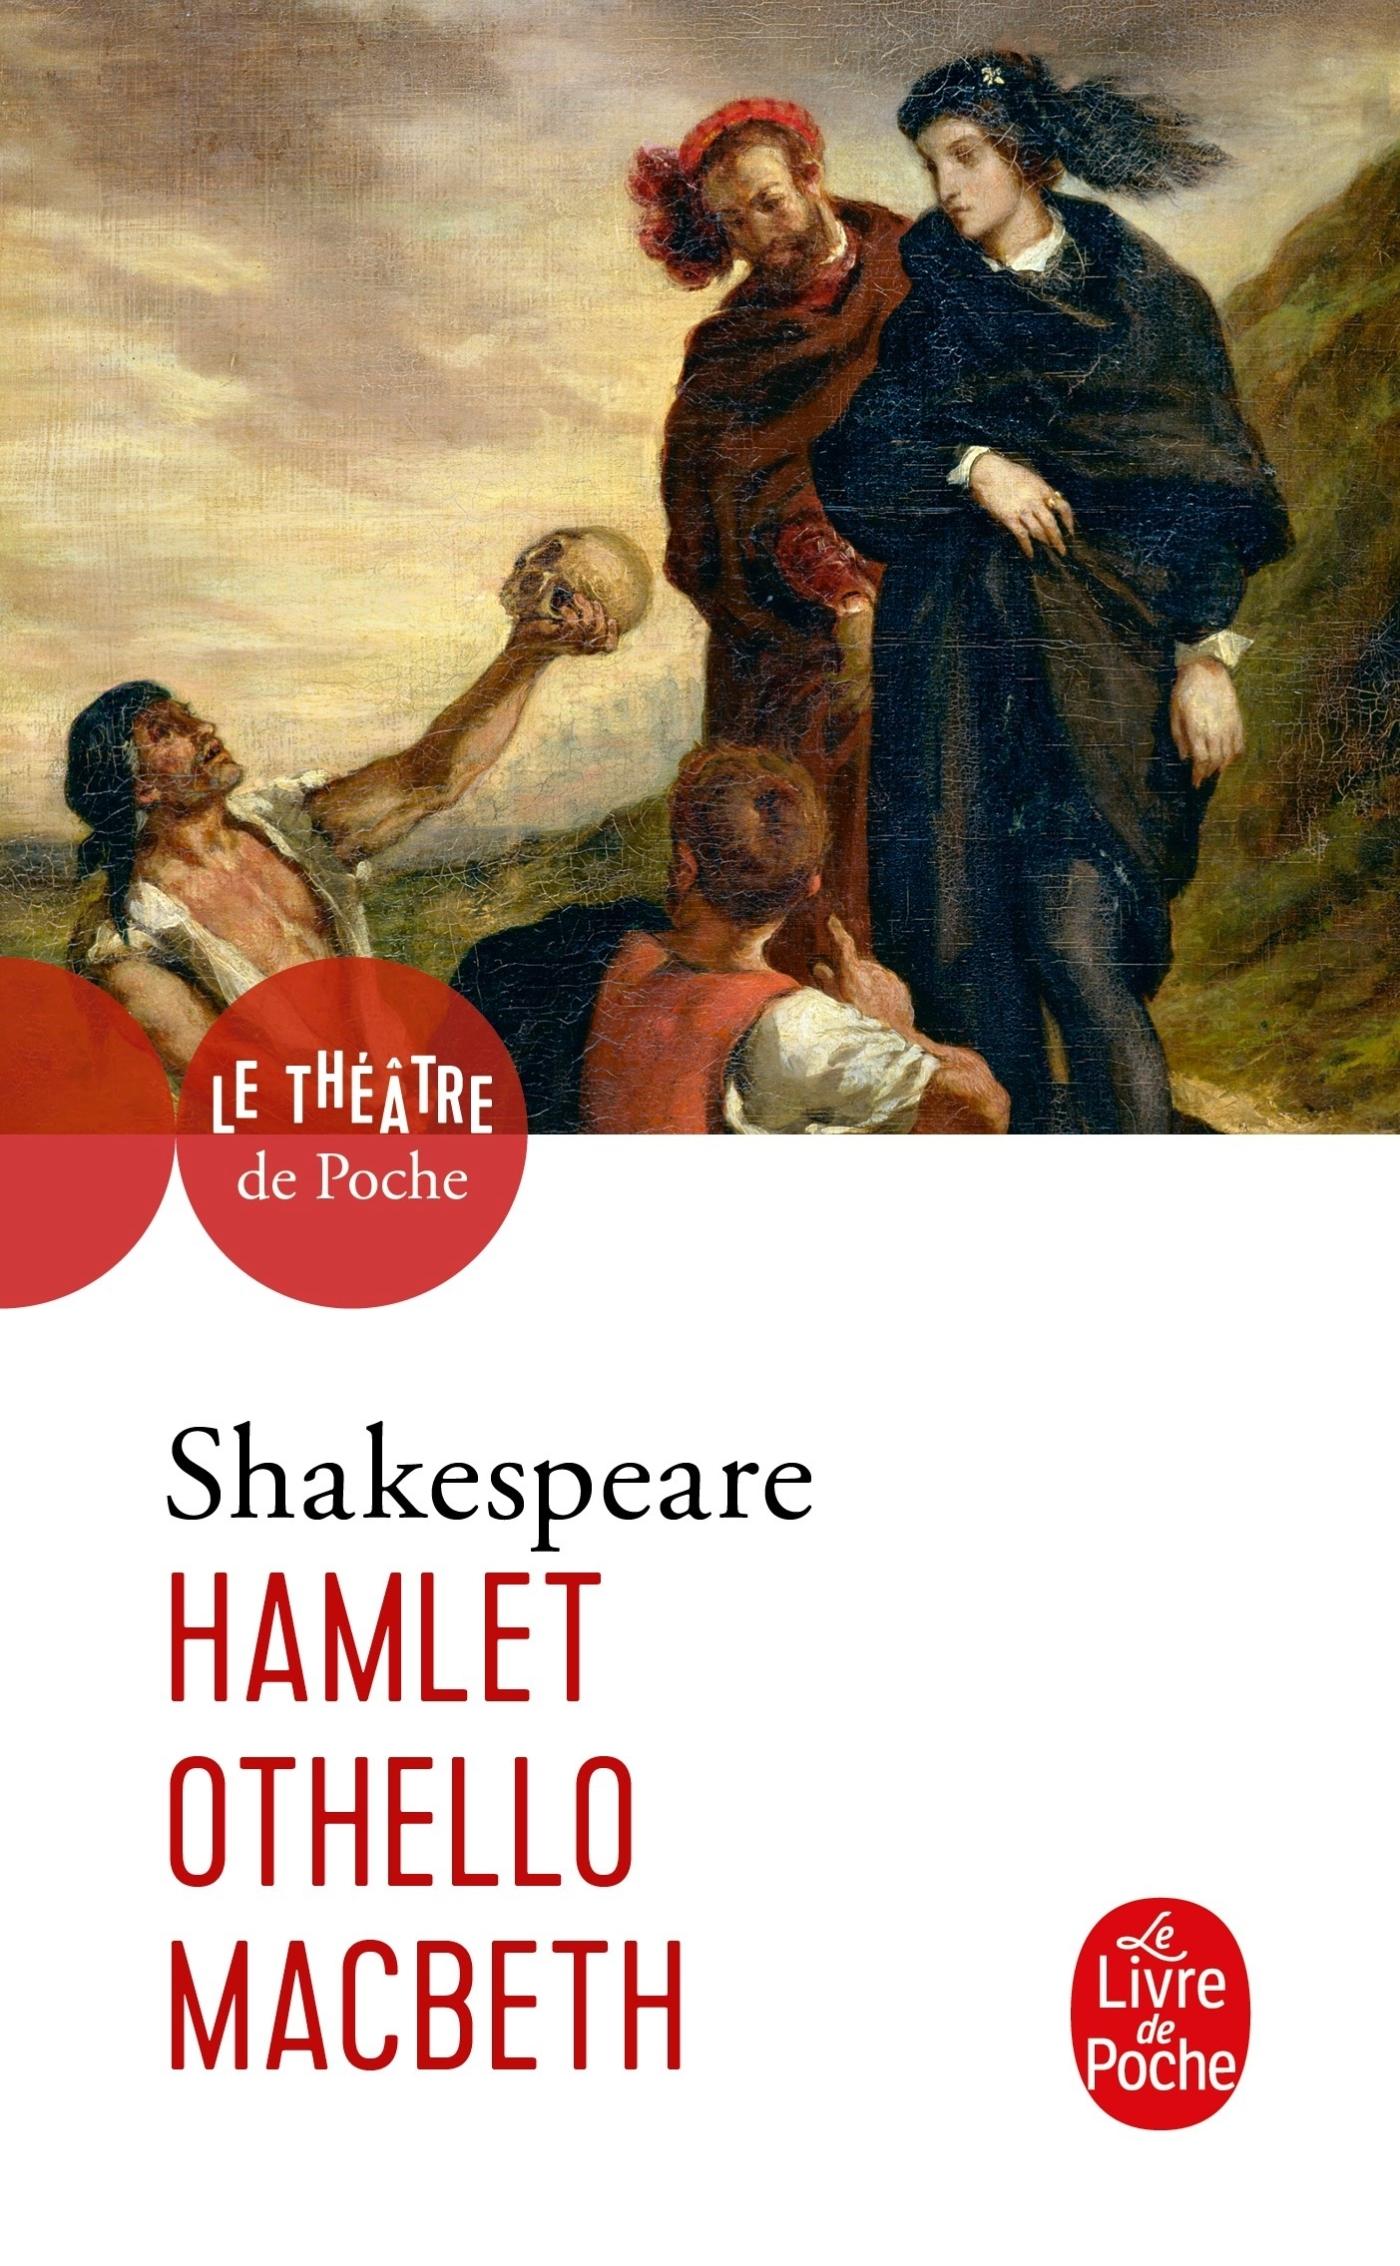 HAMLET-OTHELLO-MACBETH